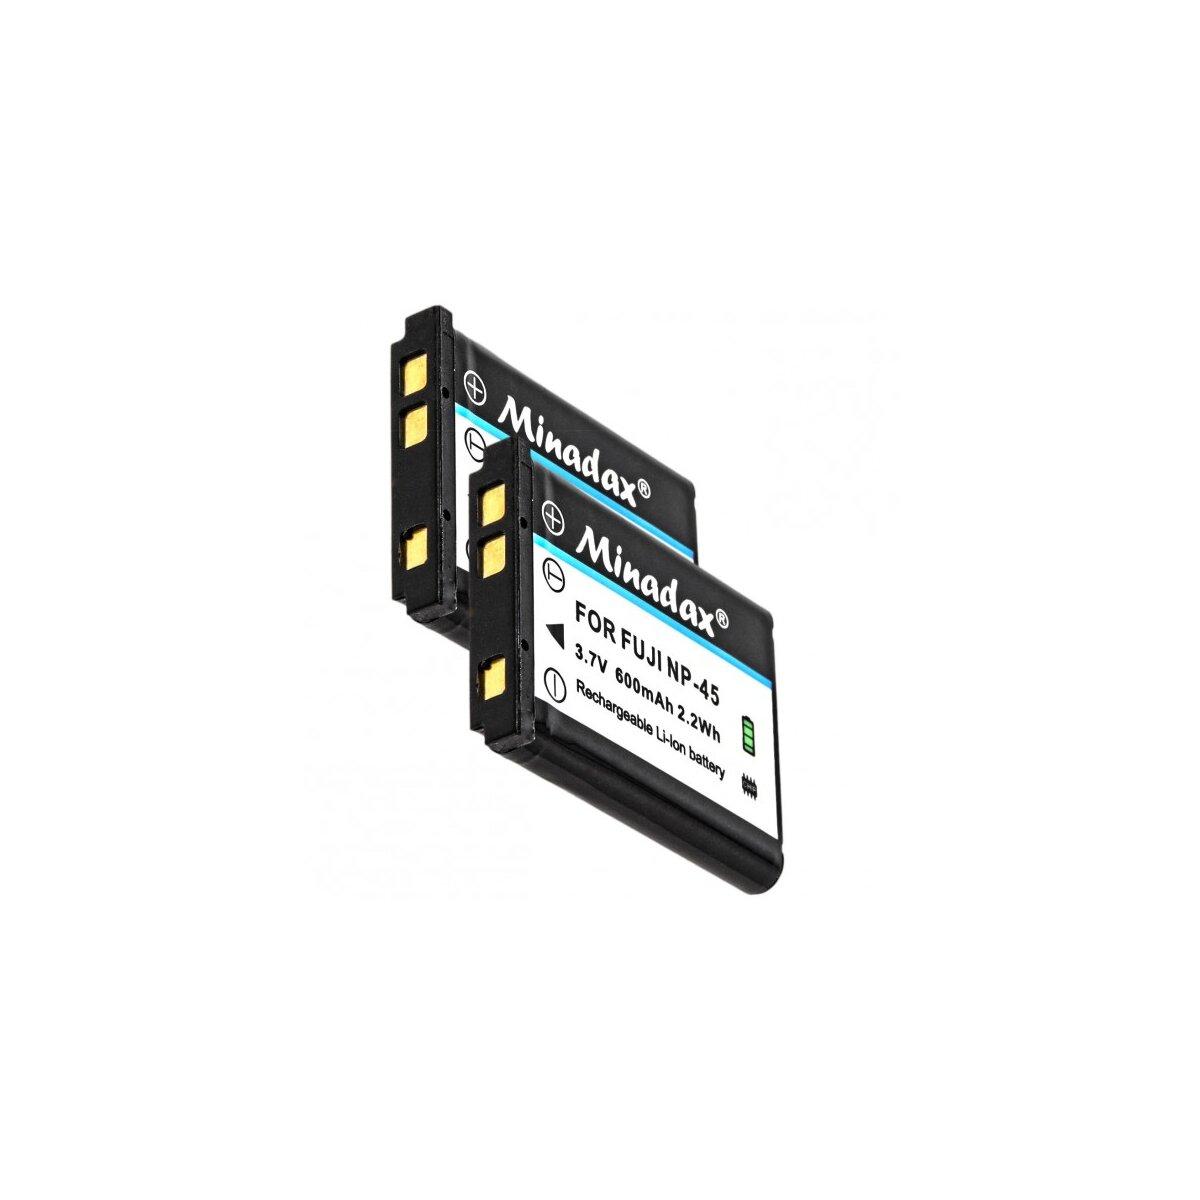 2x Minadax® Qualitaetsakku mit echten 600 mAh fuer FujiFilm, wie NP-45 - Intelligentes Akkusystem mit Chip